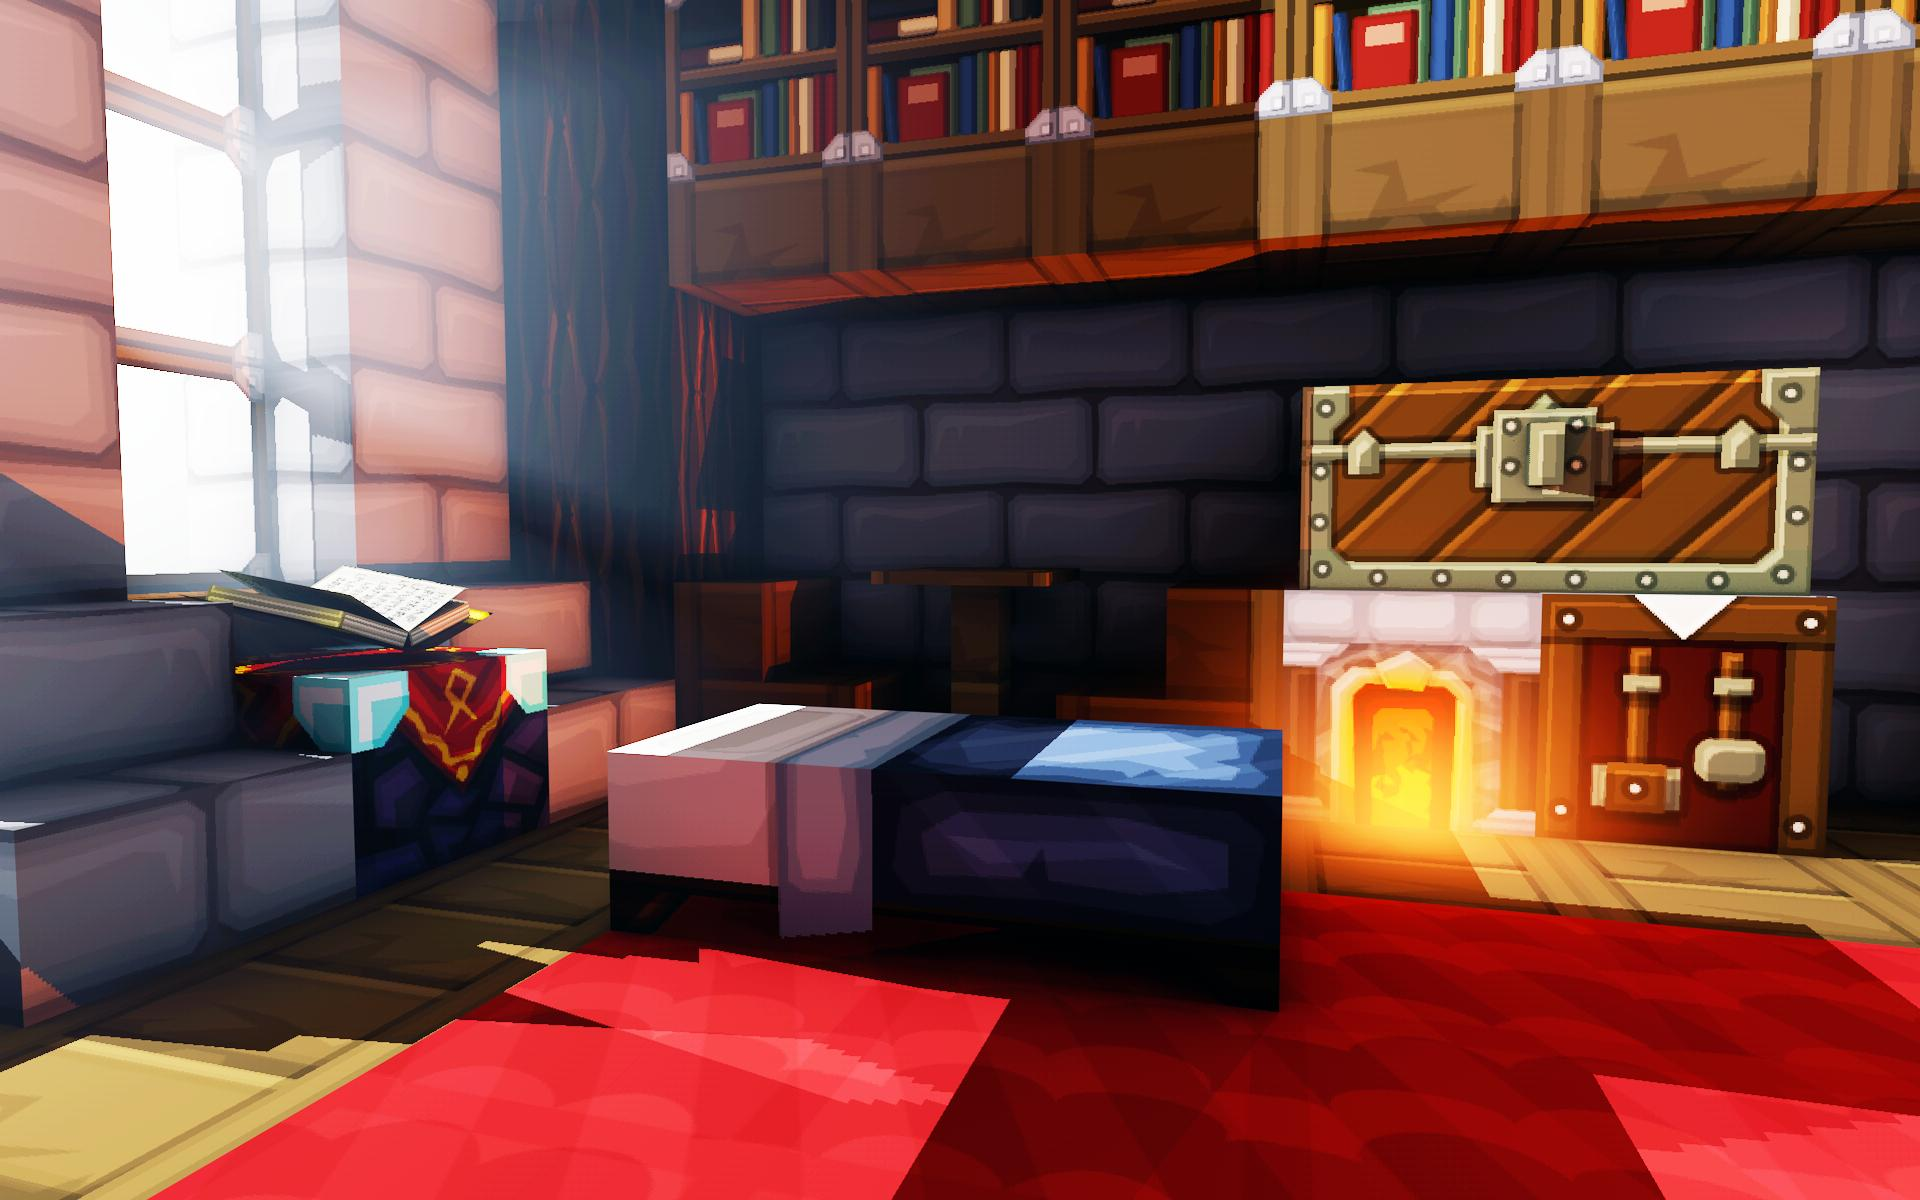 Room wallpaper Minecraft 1920x1200